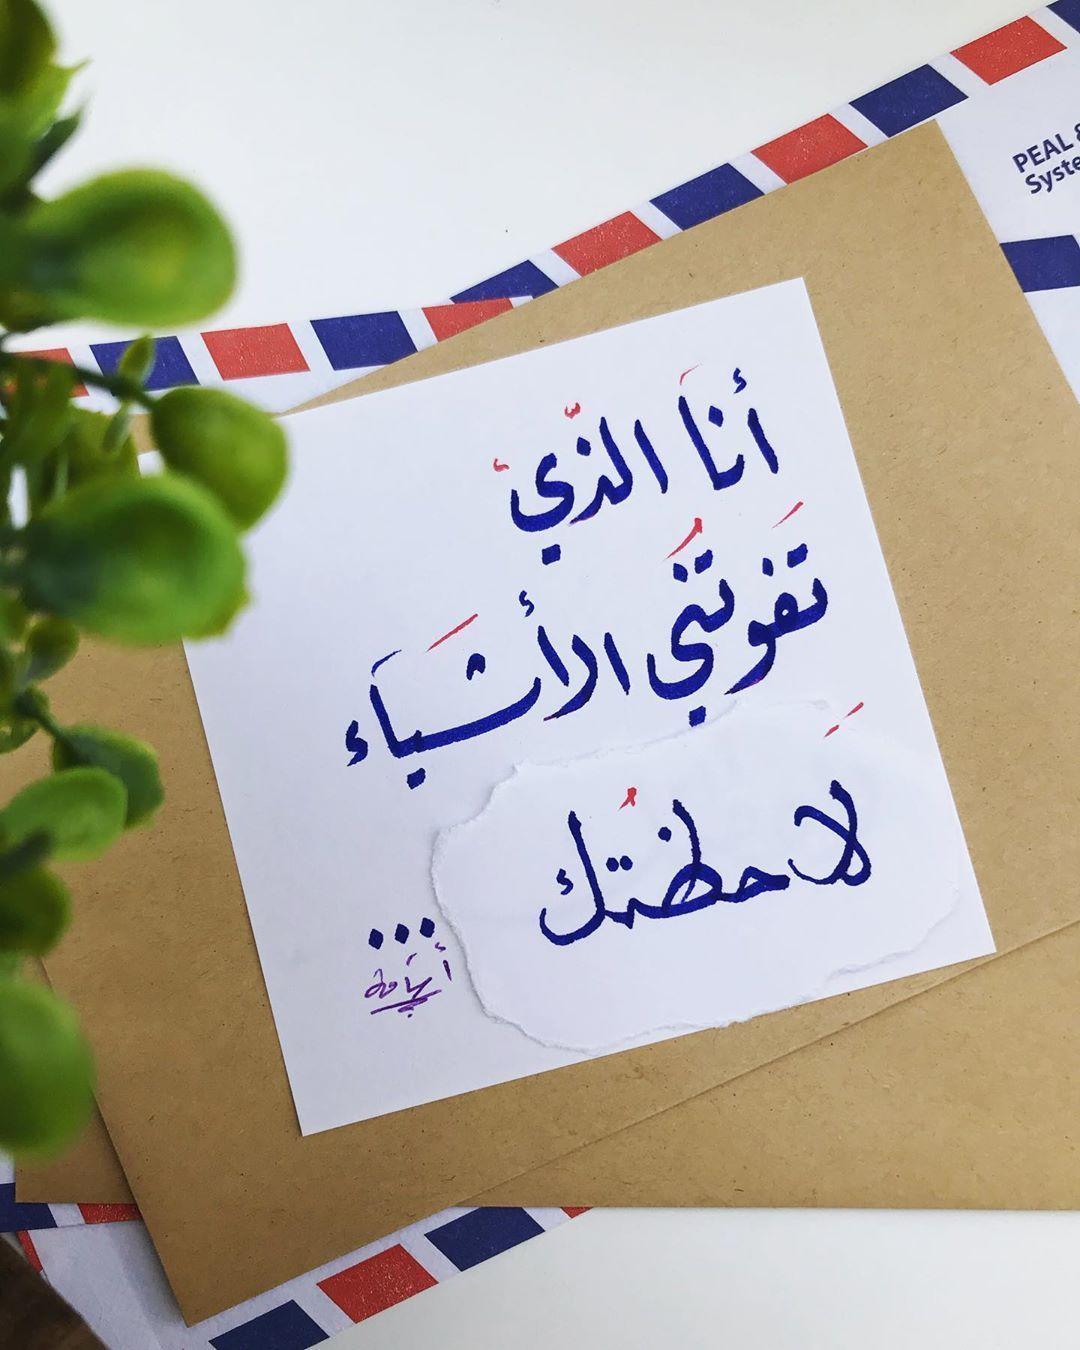 Osama M Atallah أنا الذي تفوتني الأشياء لاحظتك Beautiful Arabic Words Friends Quotes Best Friend Quotes